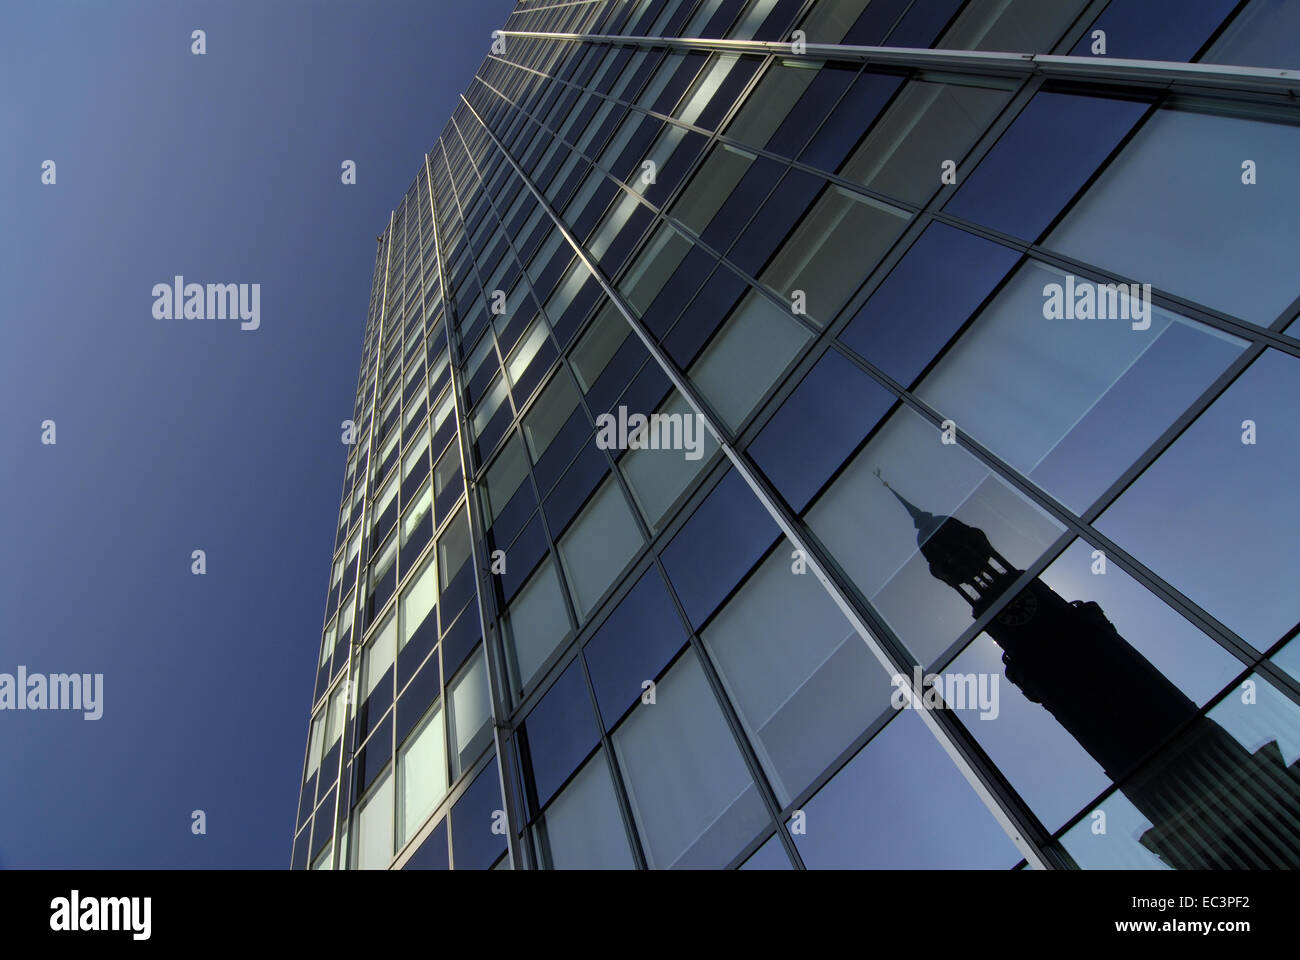 Reflexion of St. Michaelis on Glass Front, Hamburg, Germany - Stock Image